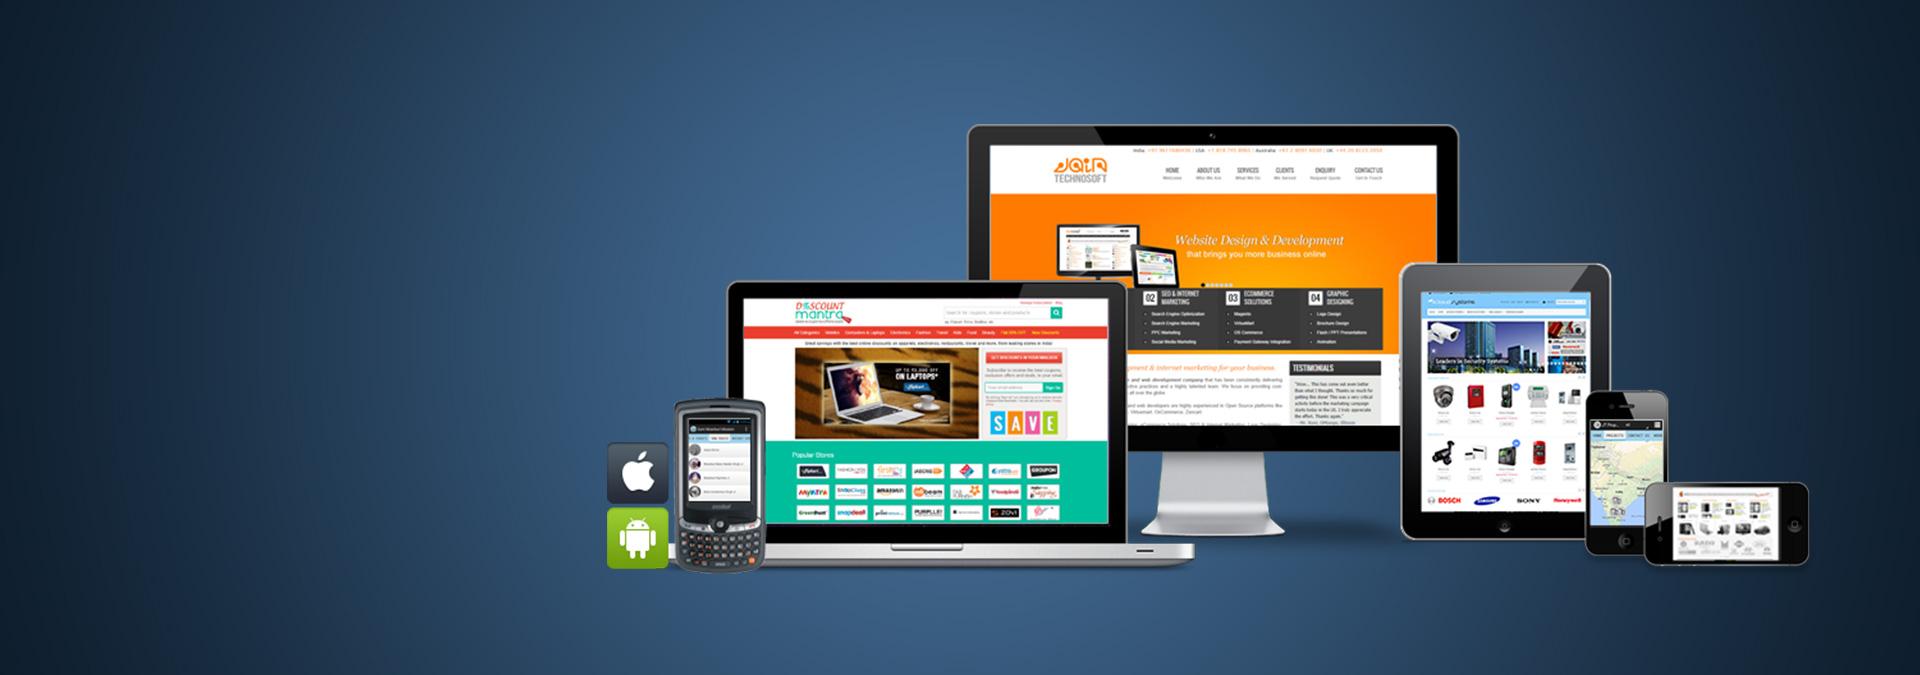 Web Design Company In Bangalore And Seo Services In Bangalore